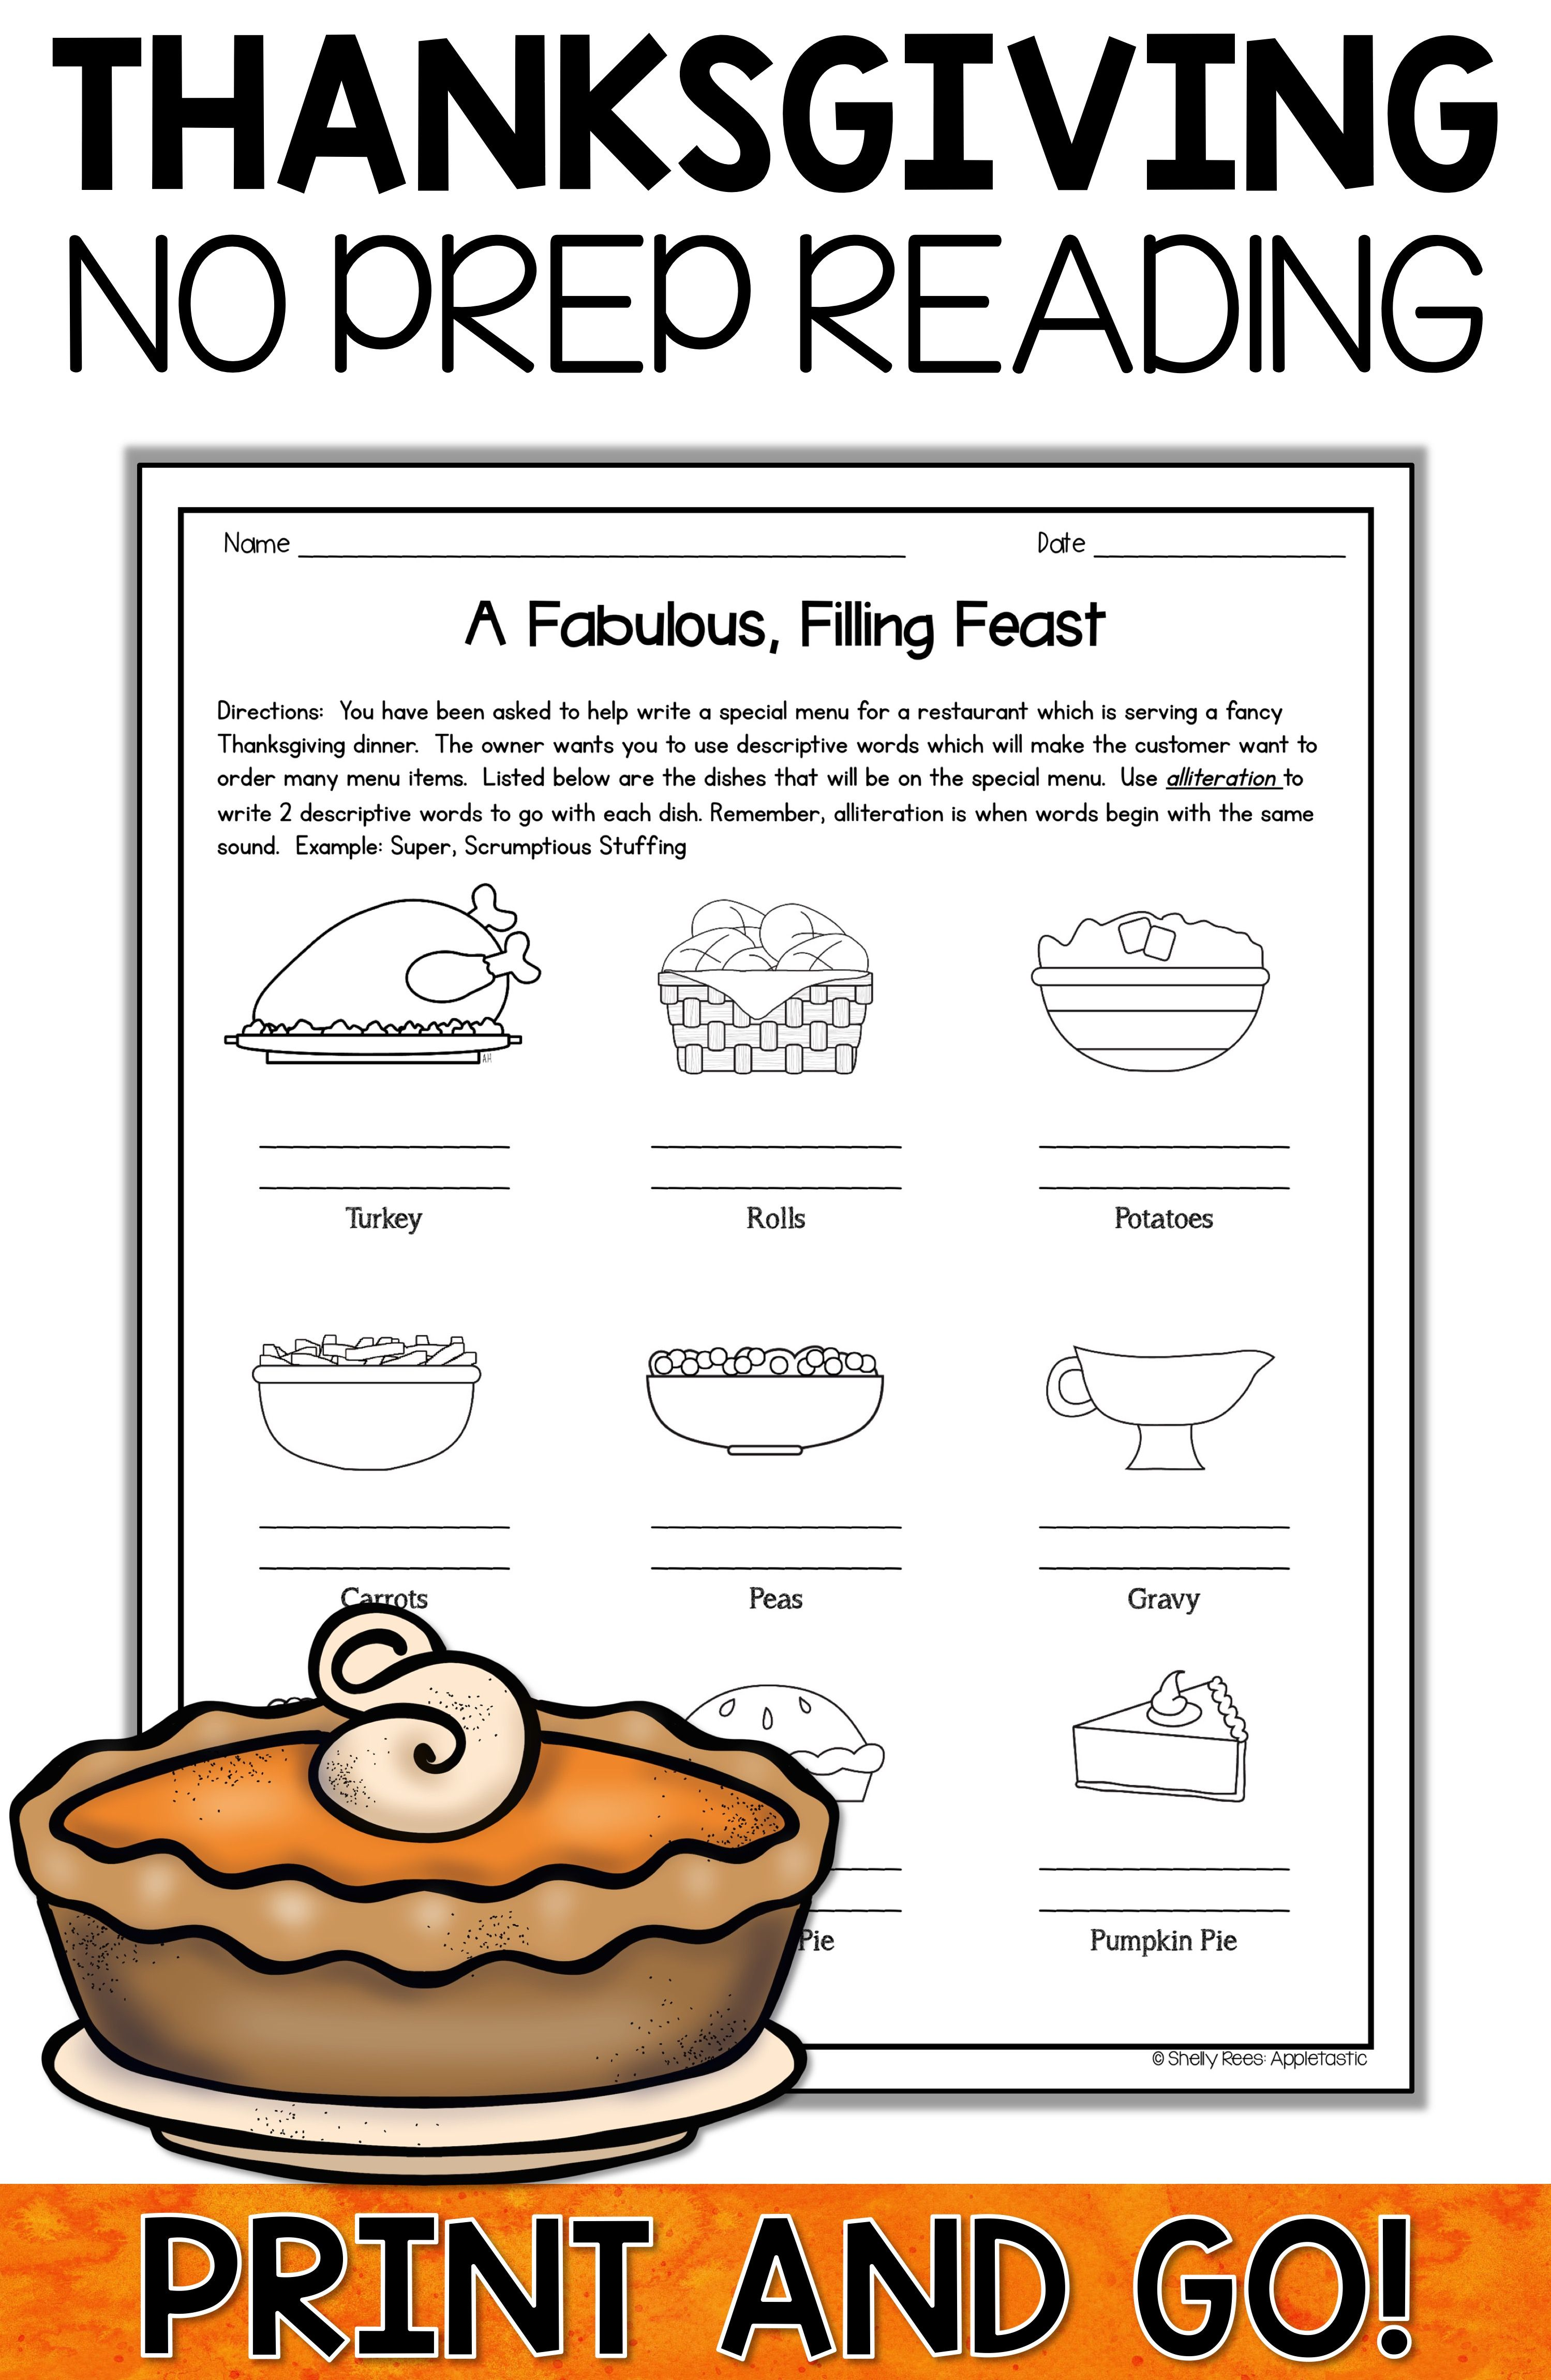 Thanksgiving Reading Activities And Thanksgiving Math Activities Are Fun For Thanksgiving Reading Activities Teaching Thanksgiving Thanksgiving Math Activities [ 4599 x 2998 Pixel ]